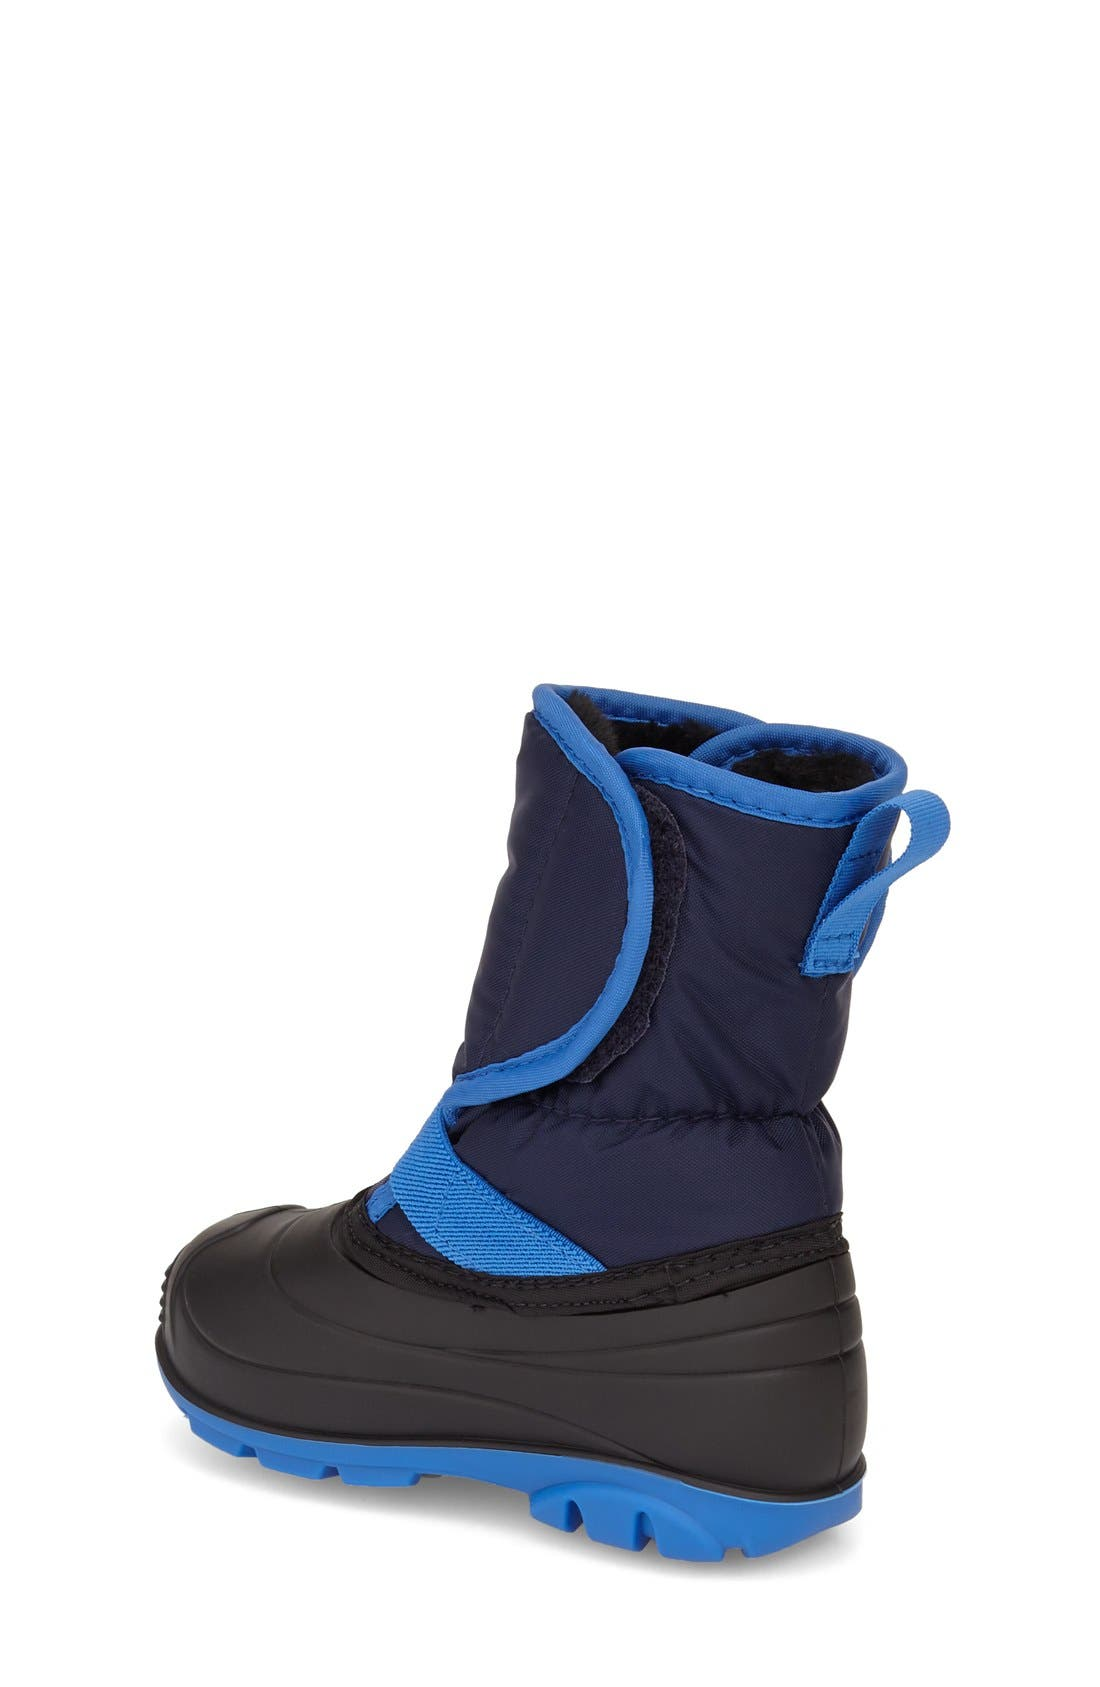 Alternate Image 2  - Kamik Pika Waterproof Faux Fur Lined Snow Boot (Walker & Toddler)